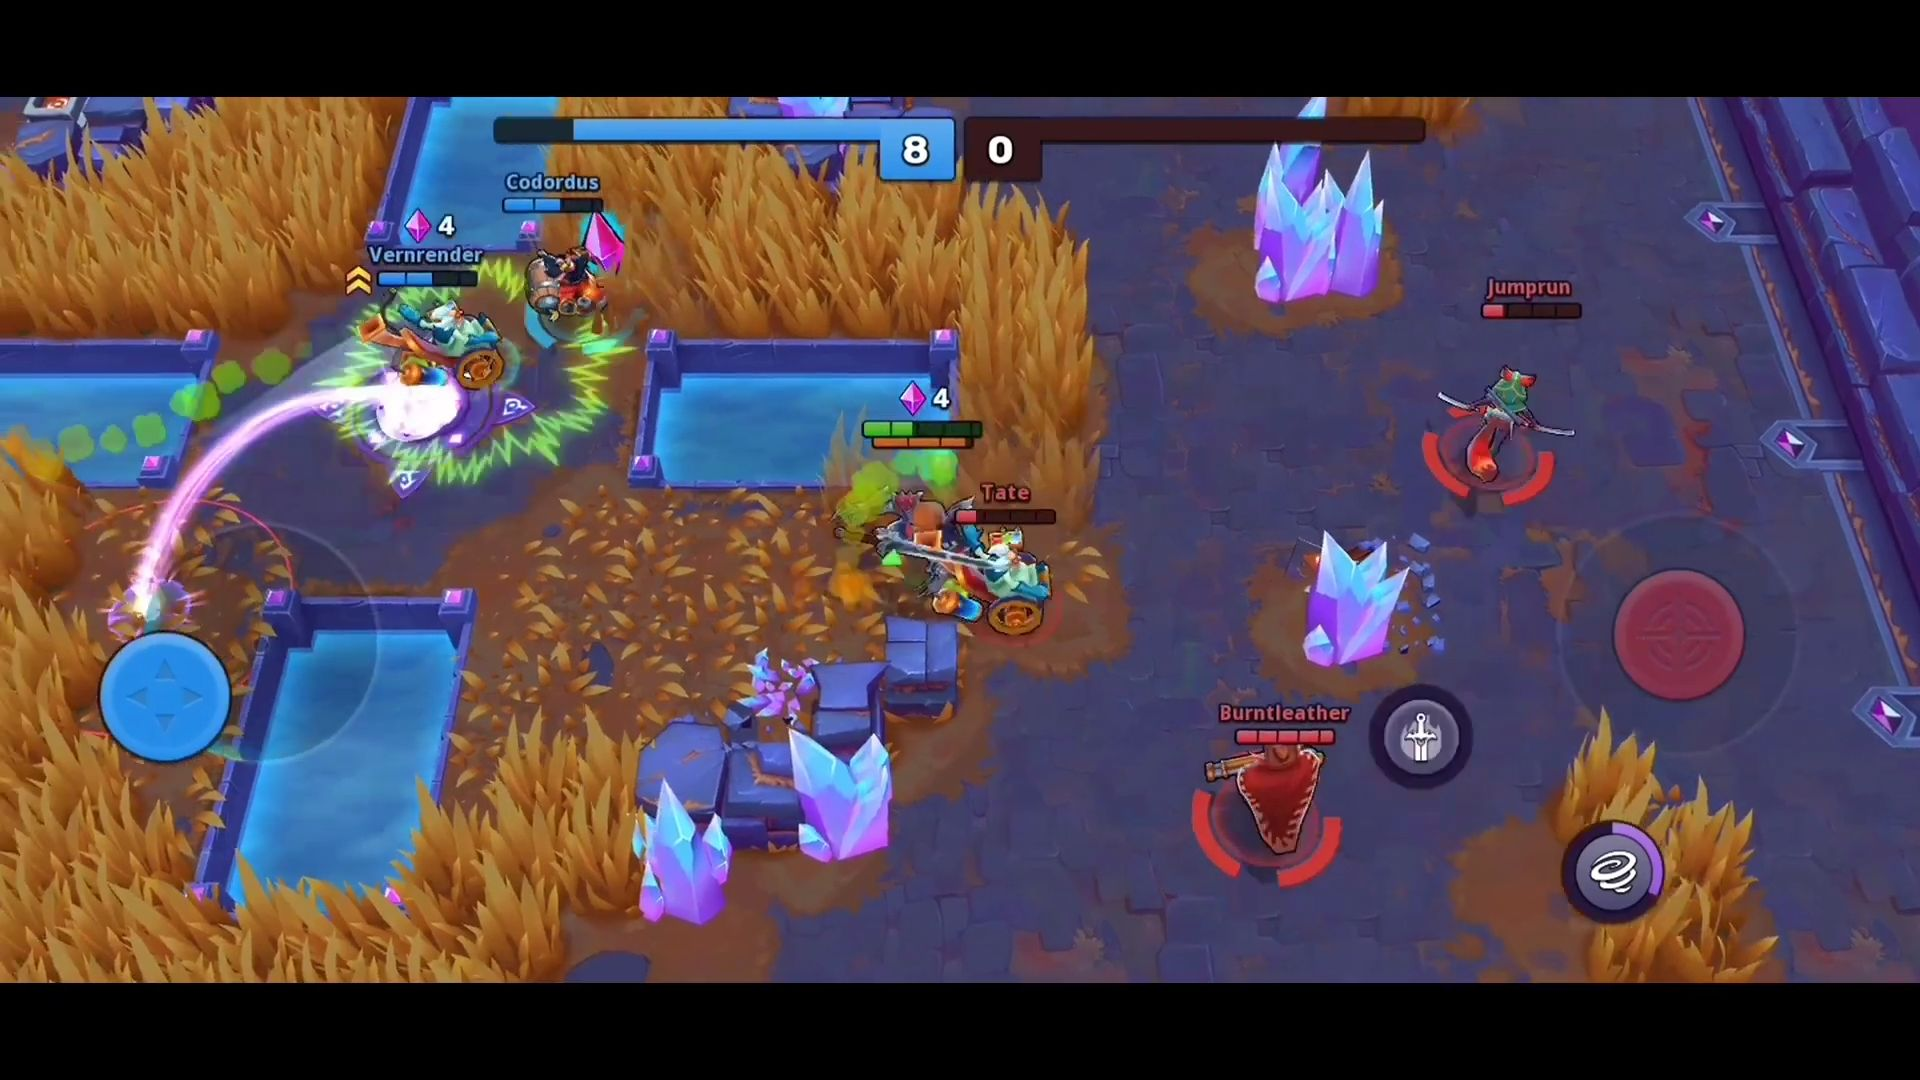 Frayhem - 3v3 Brawl, Battle Royale, MOBA Arena captura de tela 1